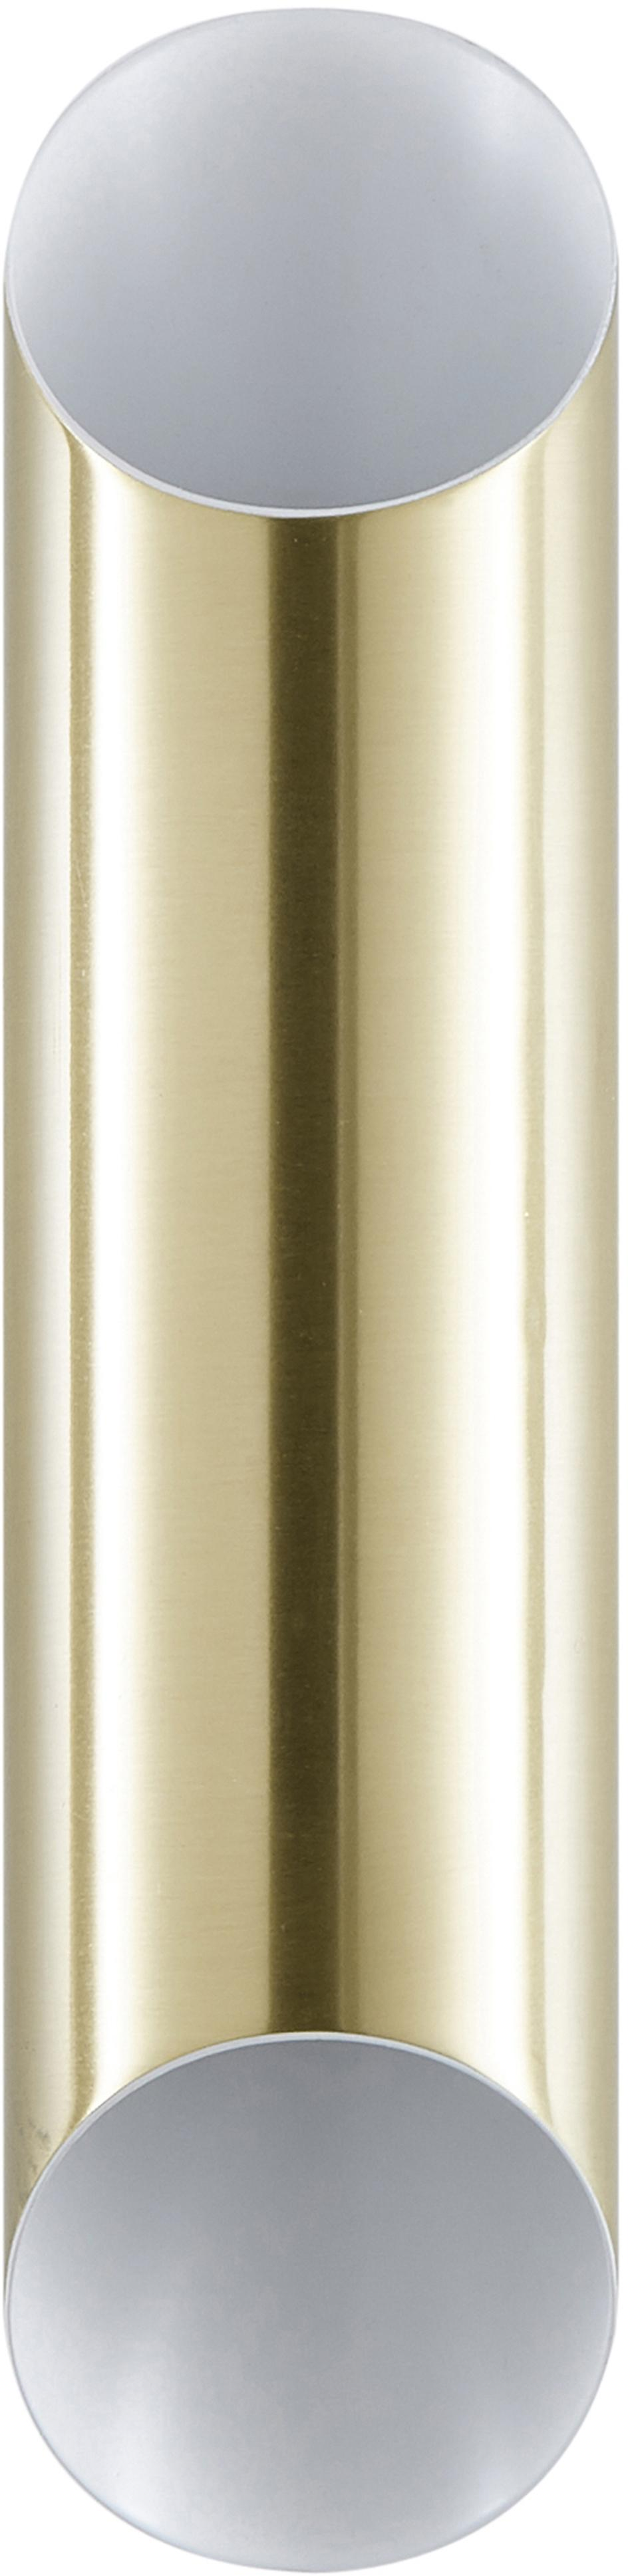 Applique Renee, Baldacchino: metallo spazzolato, Paralume: metallo spazzolato, Dorato opaco, Larg. 7 x Alt. 28 cm